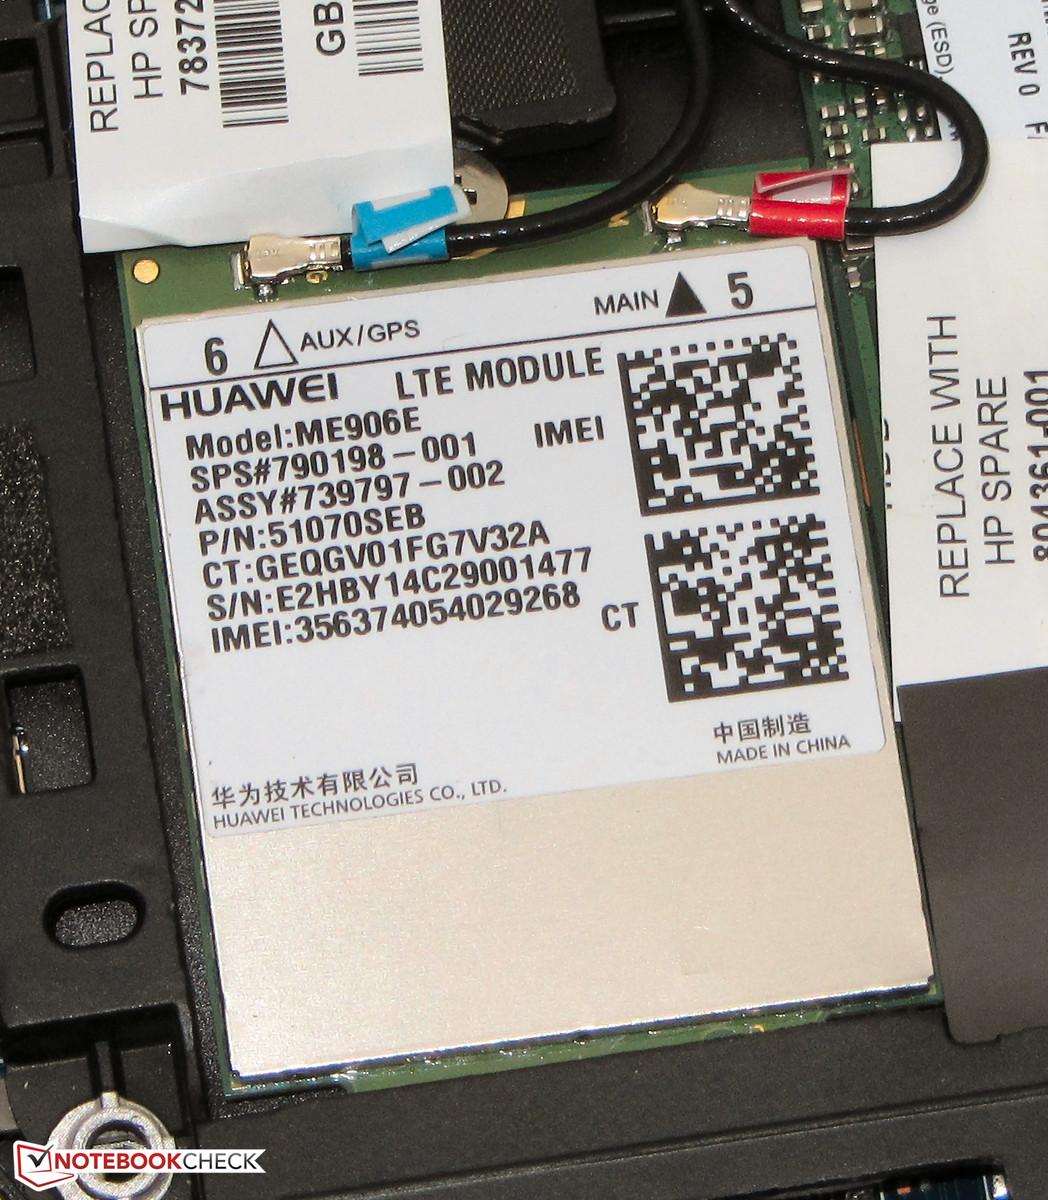 HP ELITEBOOK 810 G2 HUAWEI MODEM DRIVERS FOR WINDOWS XP